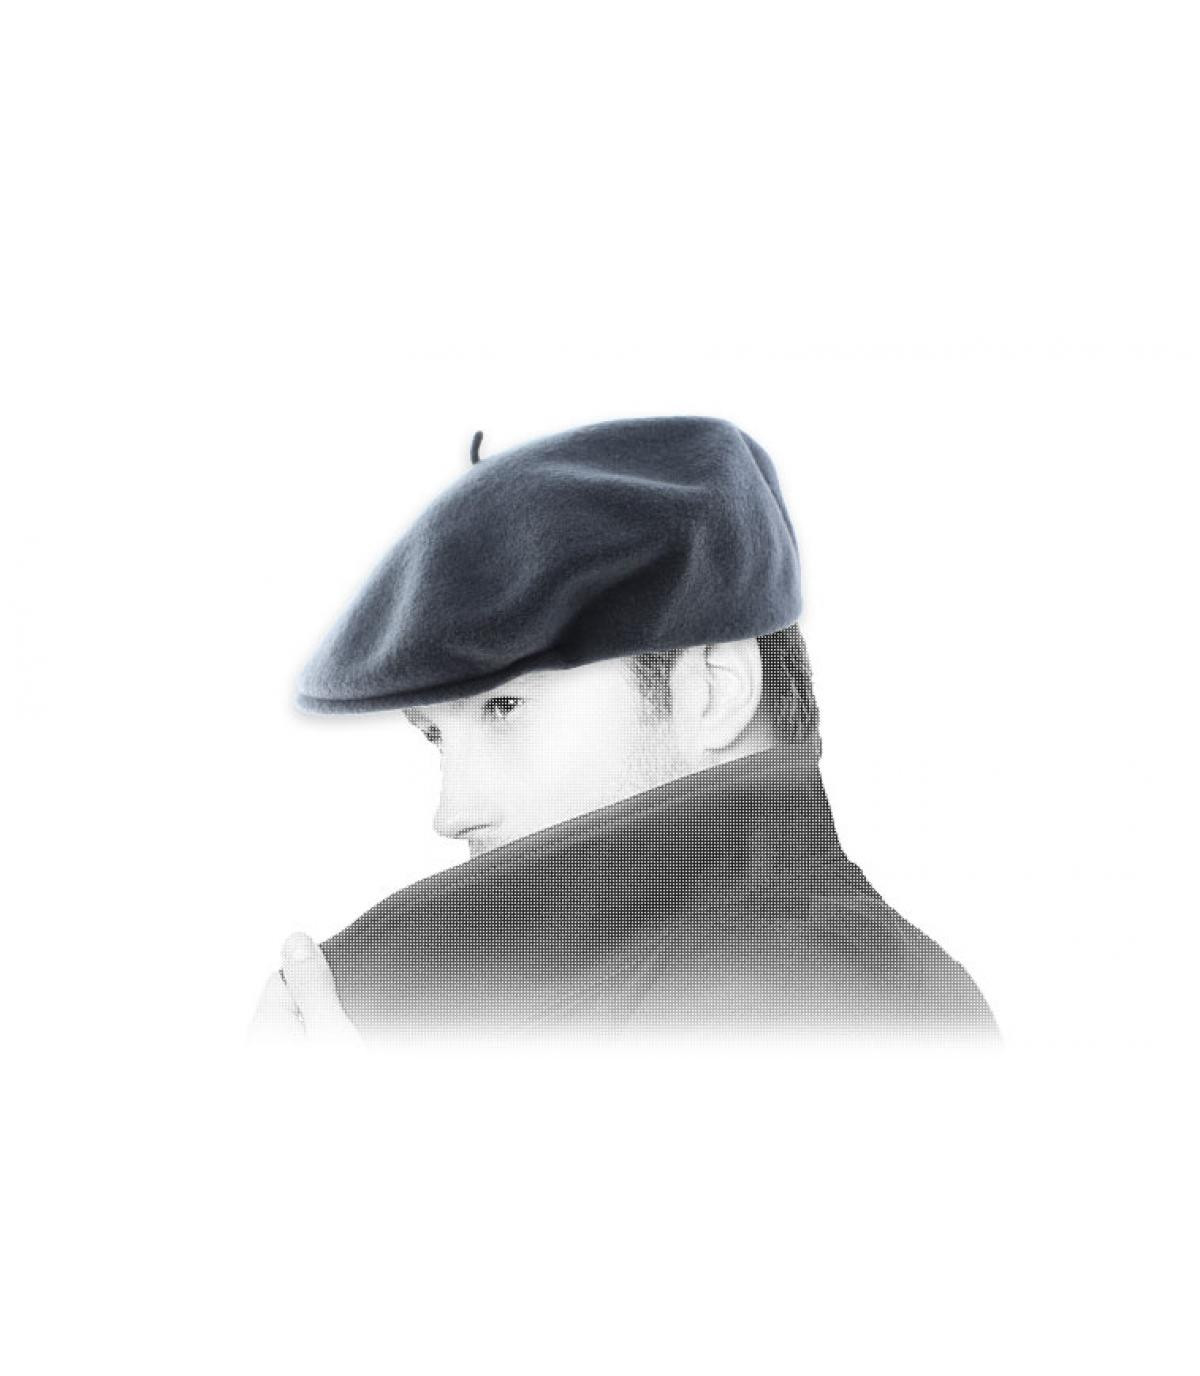 eendenbek grijze baret Laulhère